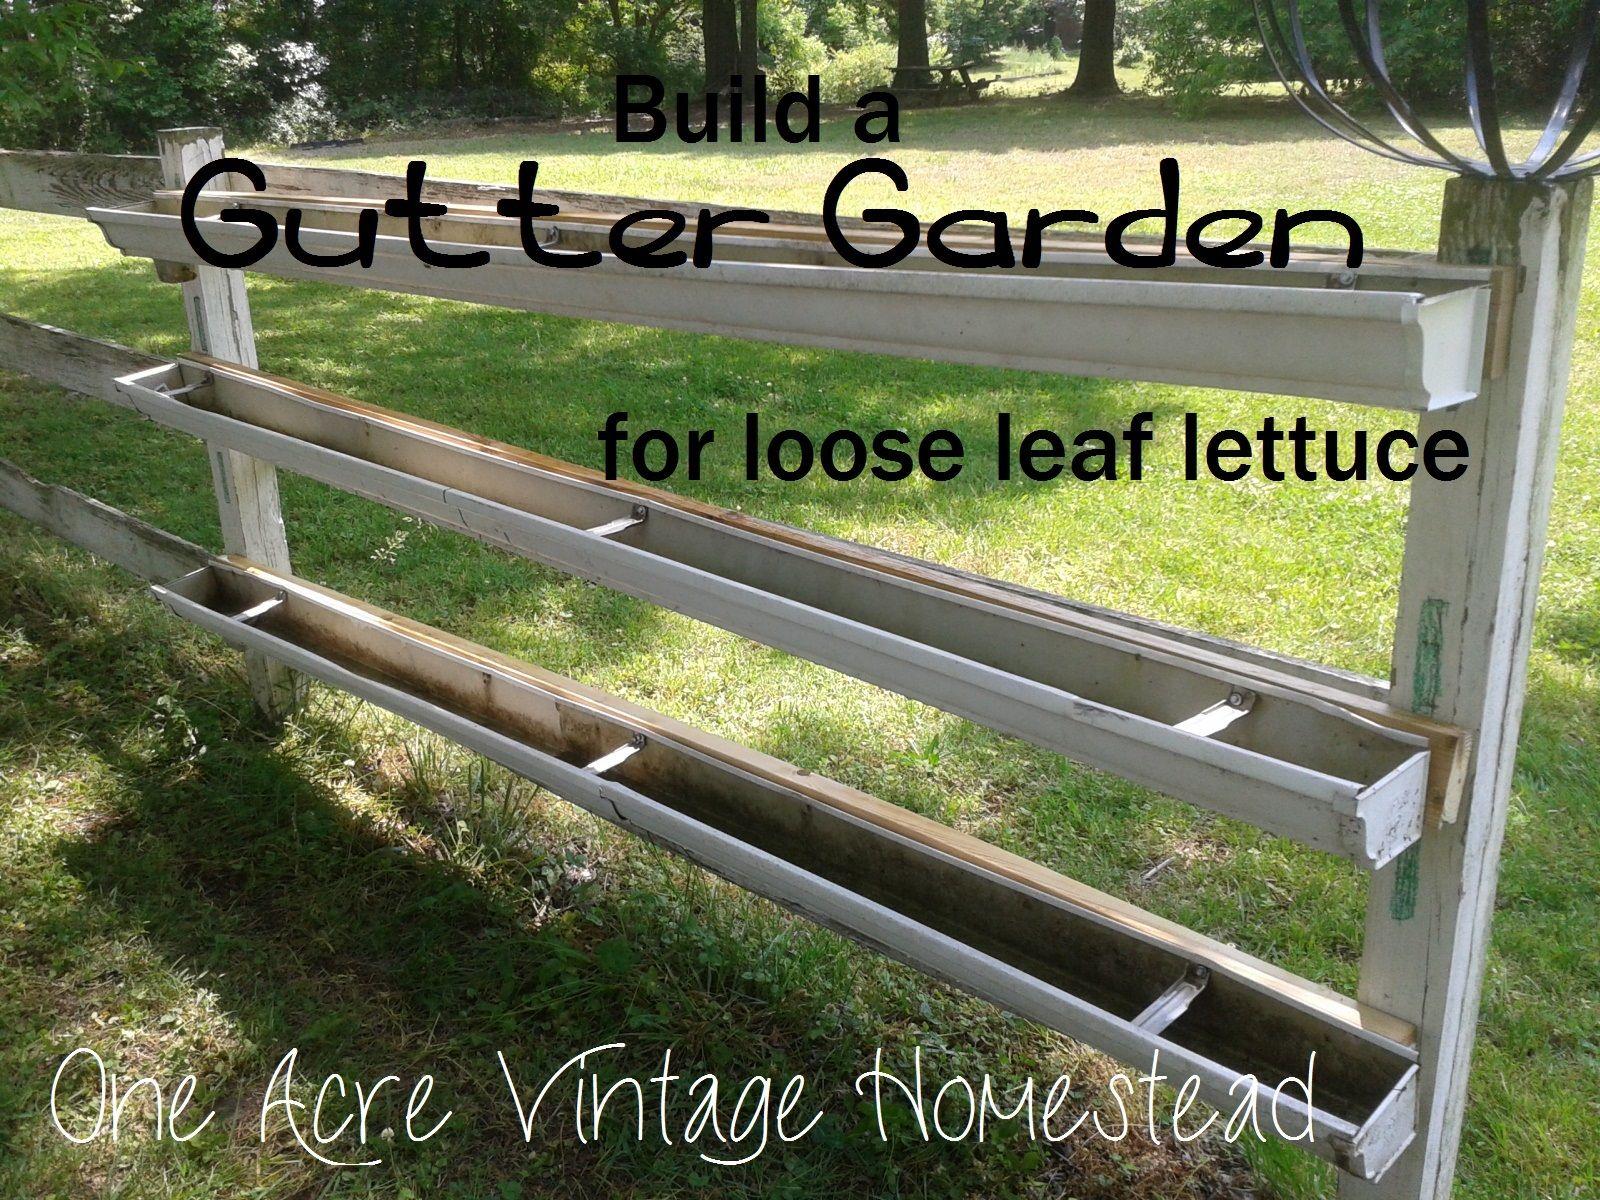 Building A Lettuce Gutter Garden One Acre Vintage Homestead How To Gutter Garden Vege Garden Ideas Garden